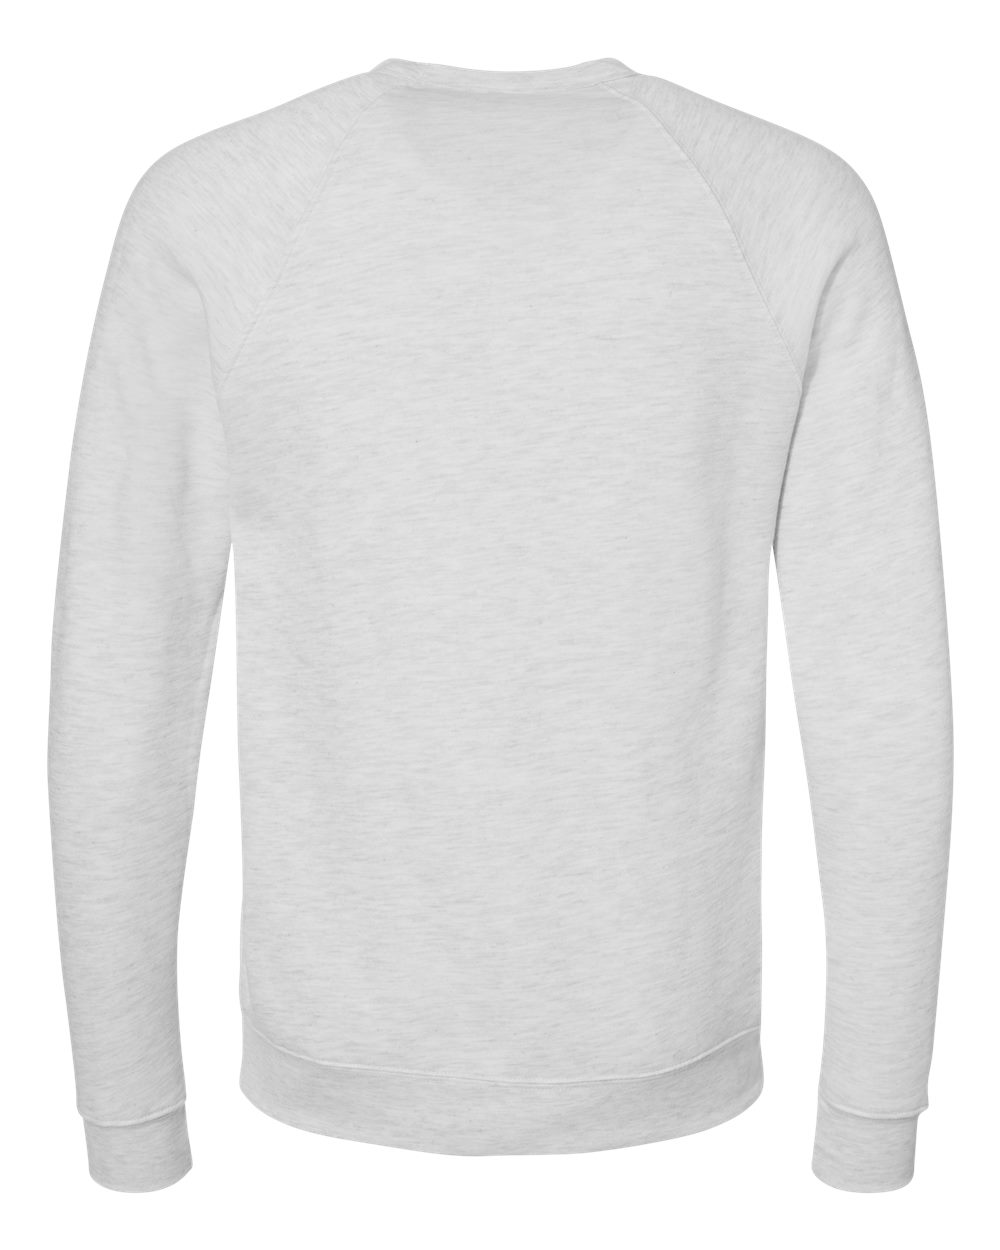 Bella-Canvas-Unisex-Sponge-Fleece-Crewneck-Sweatshirt-Top-Blank-3901-up-to-2XL thumbnail 6